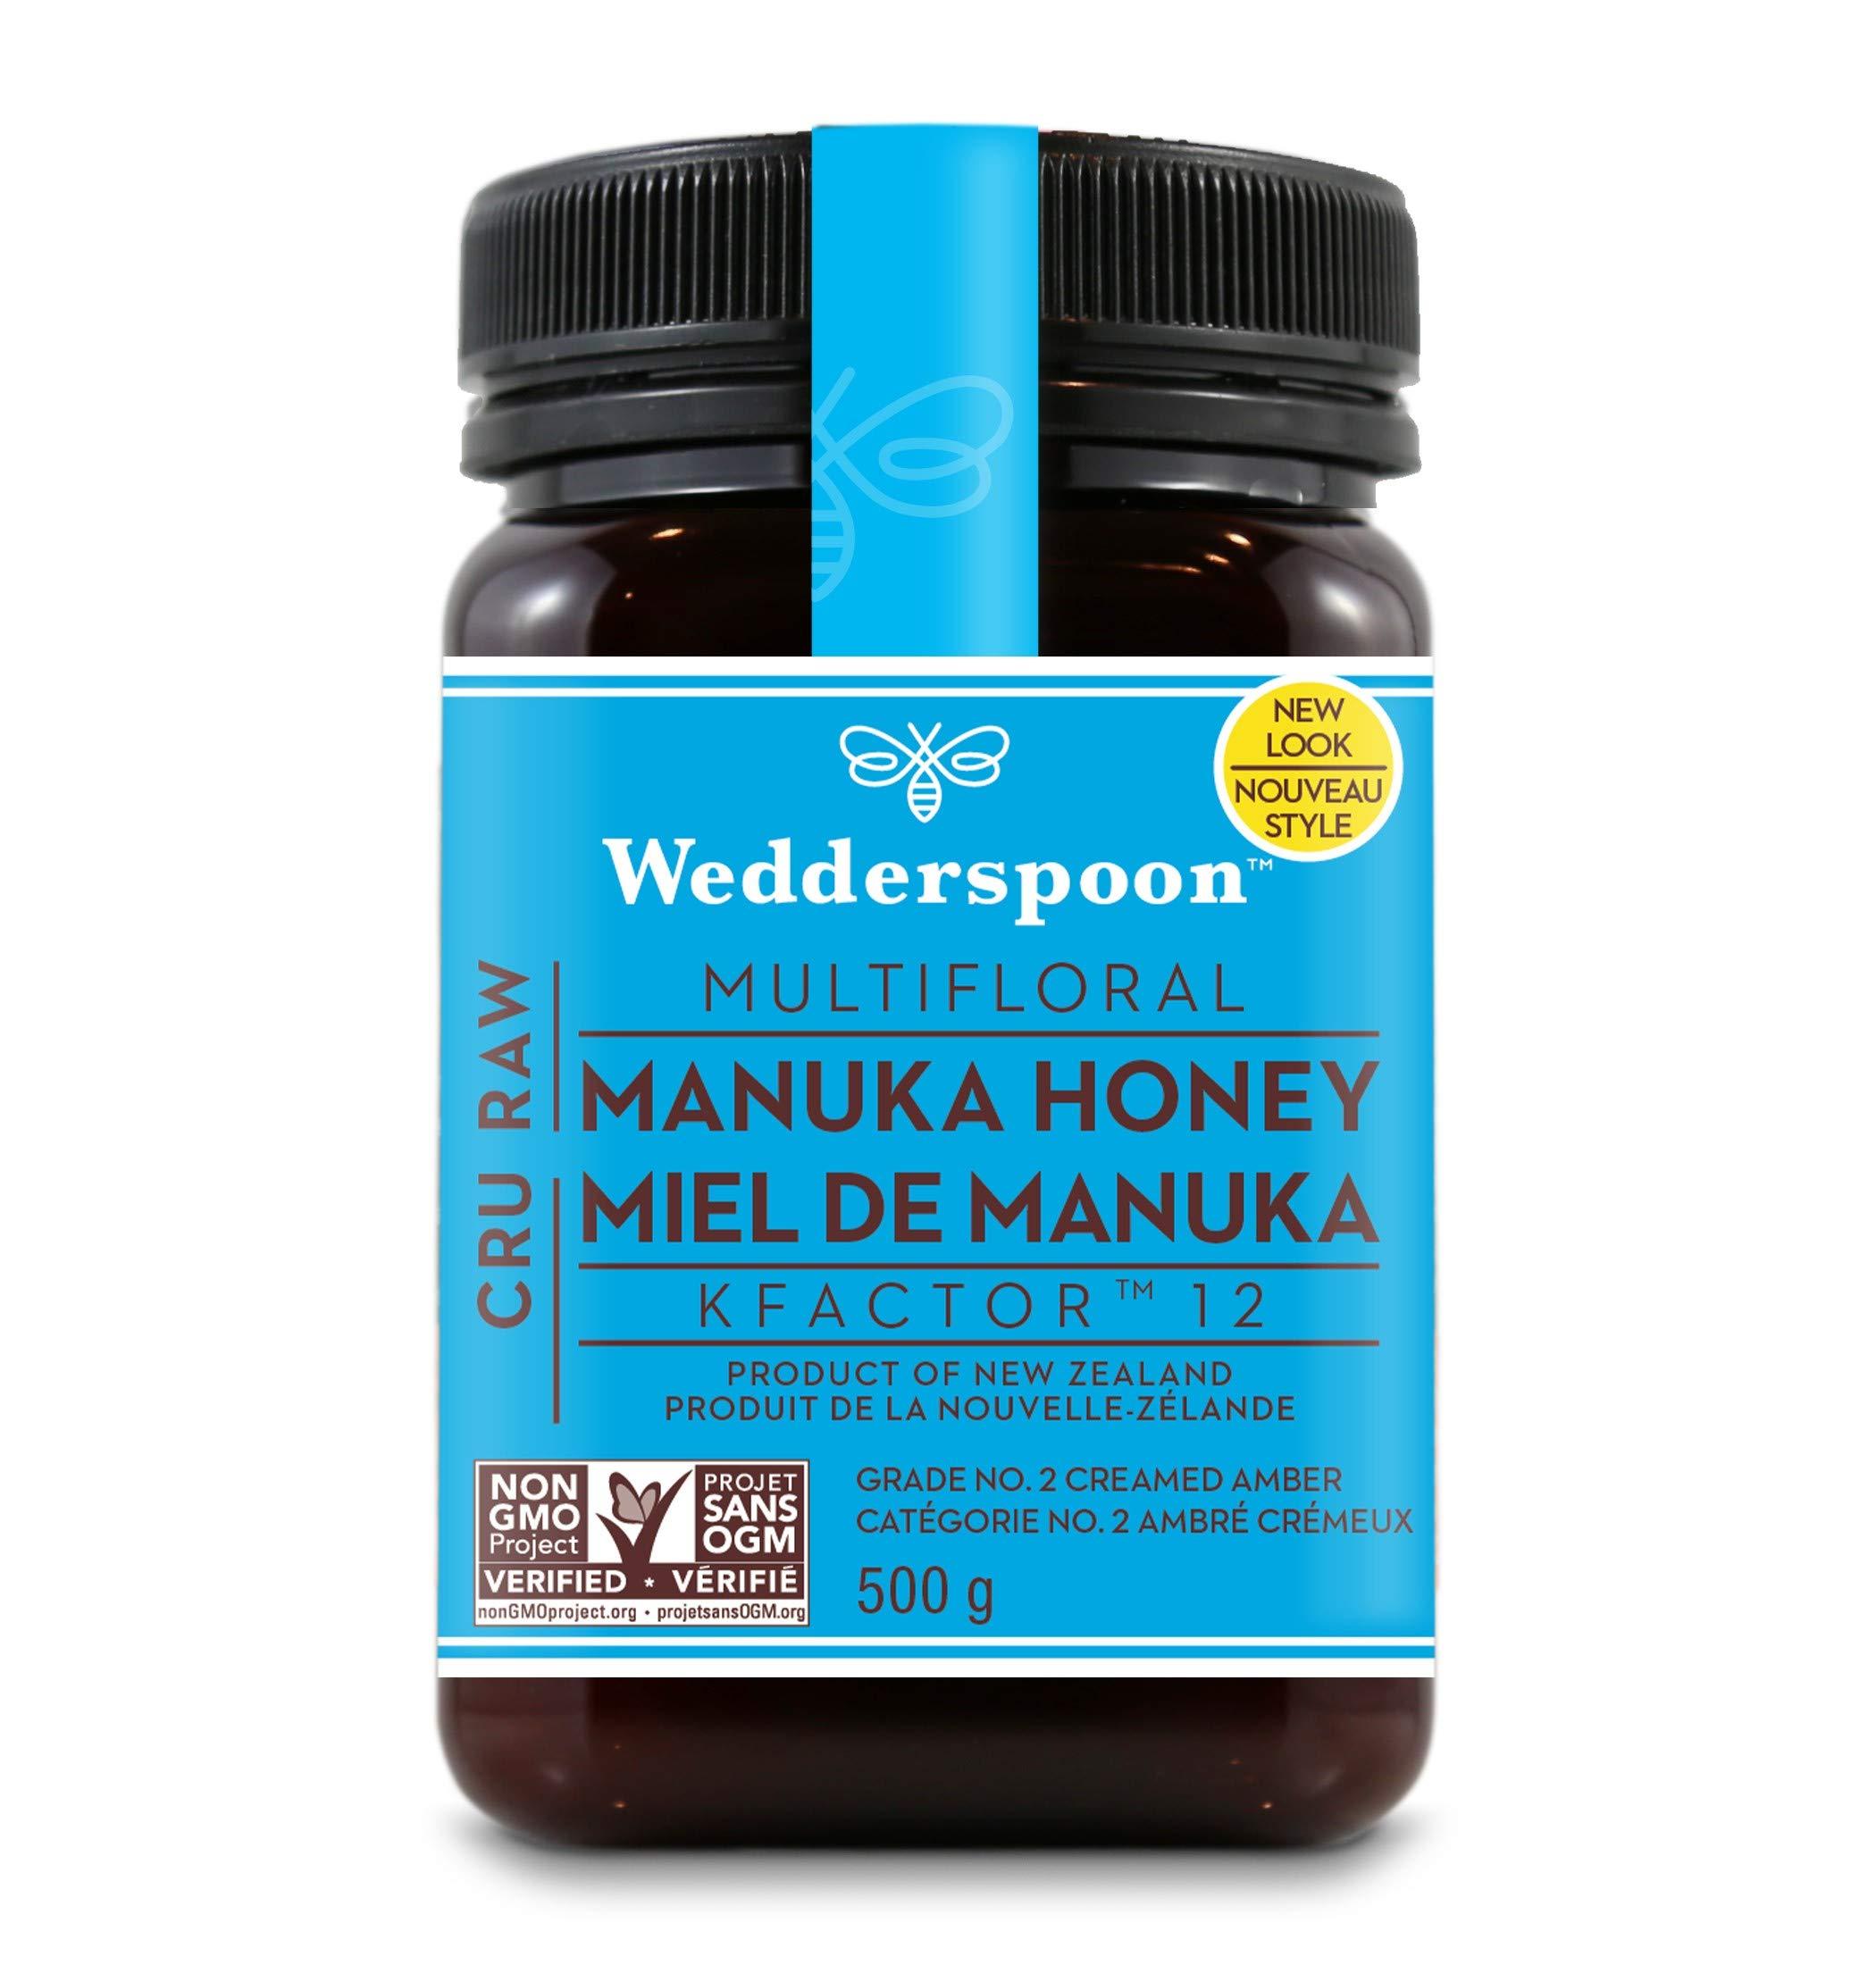 Wedderspoon Raw Premium Kfactor 12 Manuka Honey, 17.6 Ounce